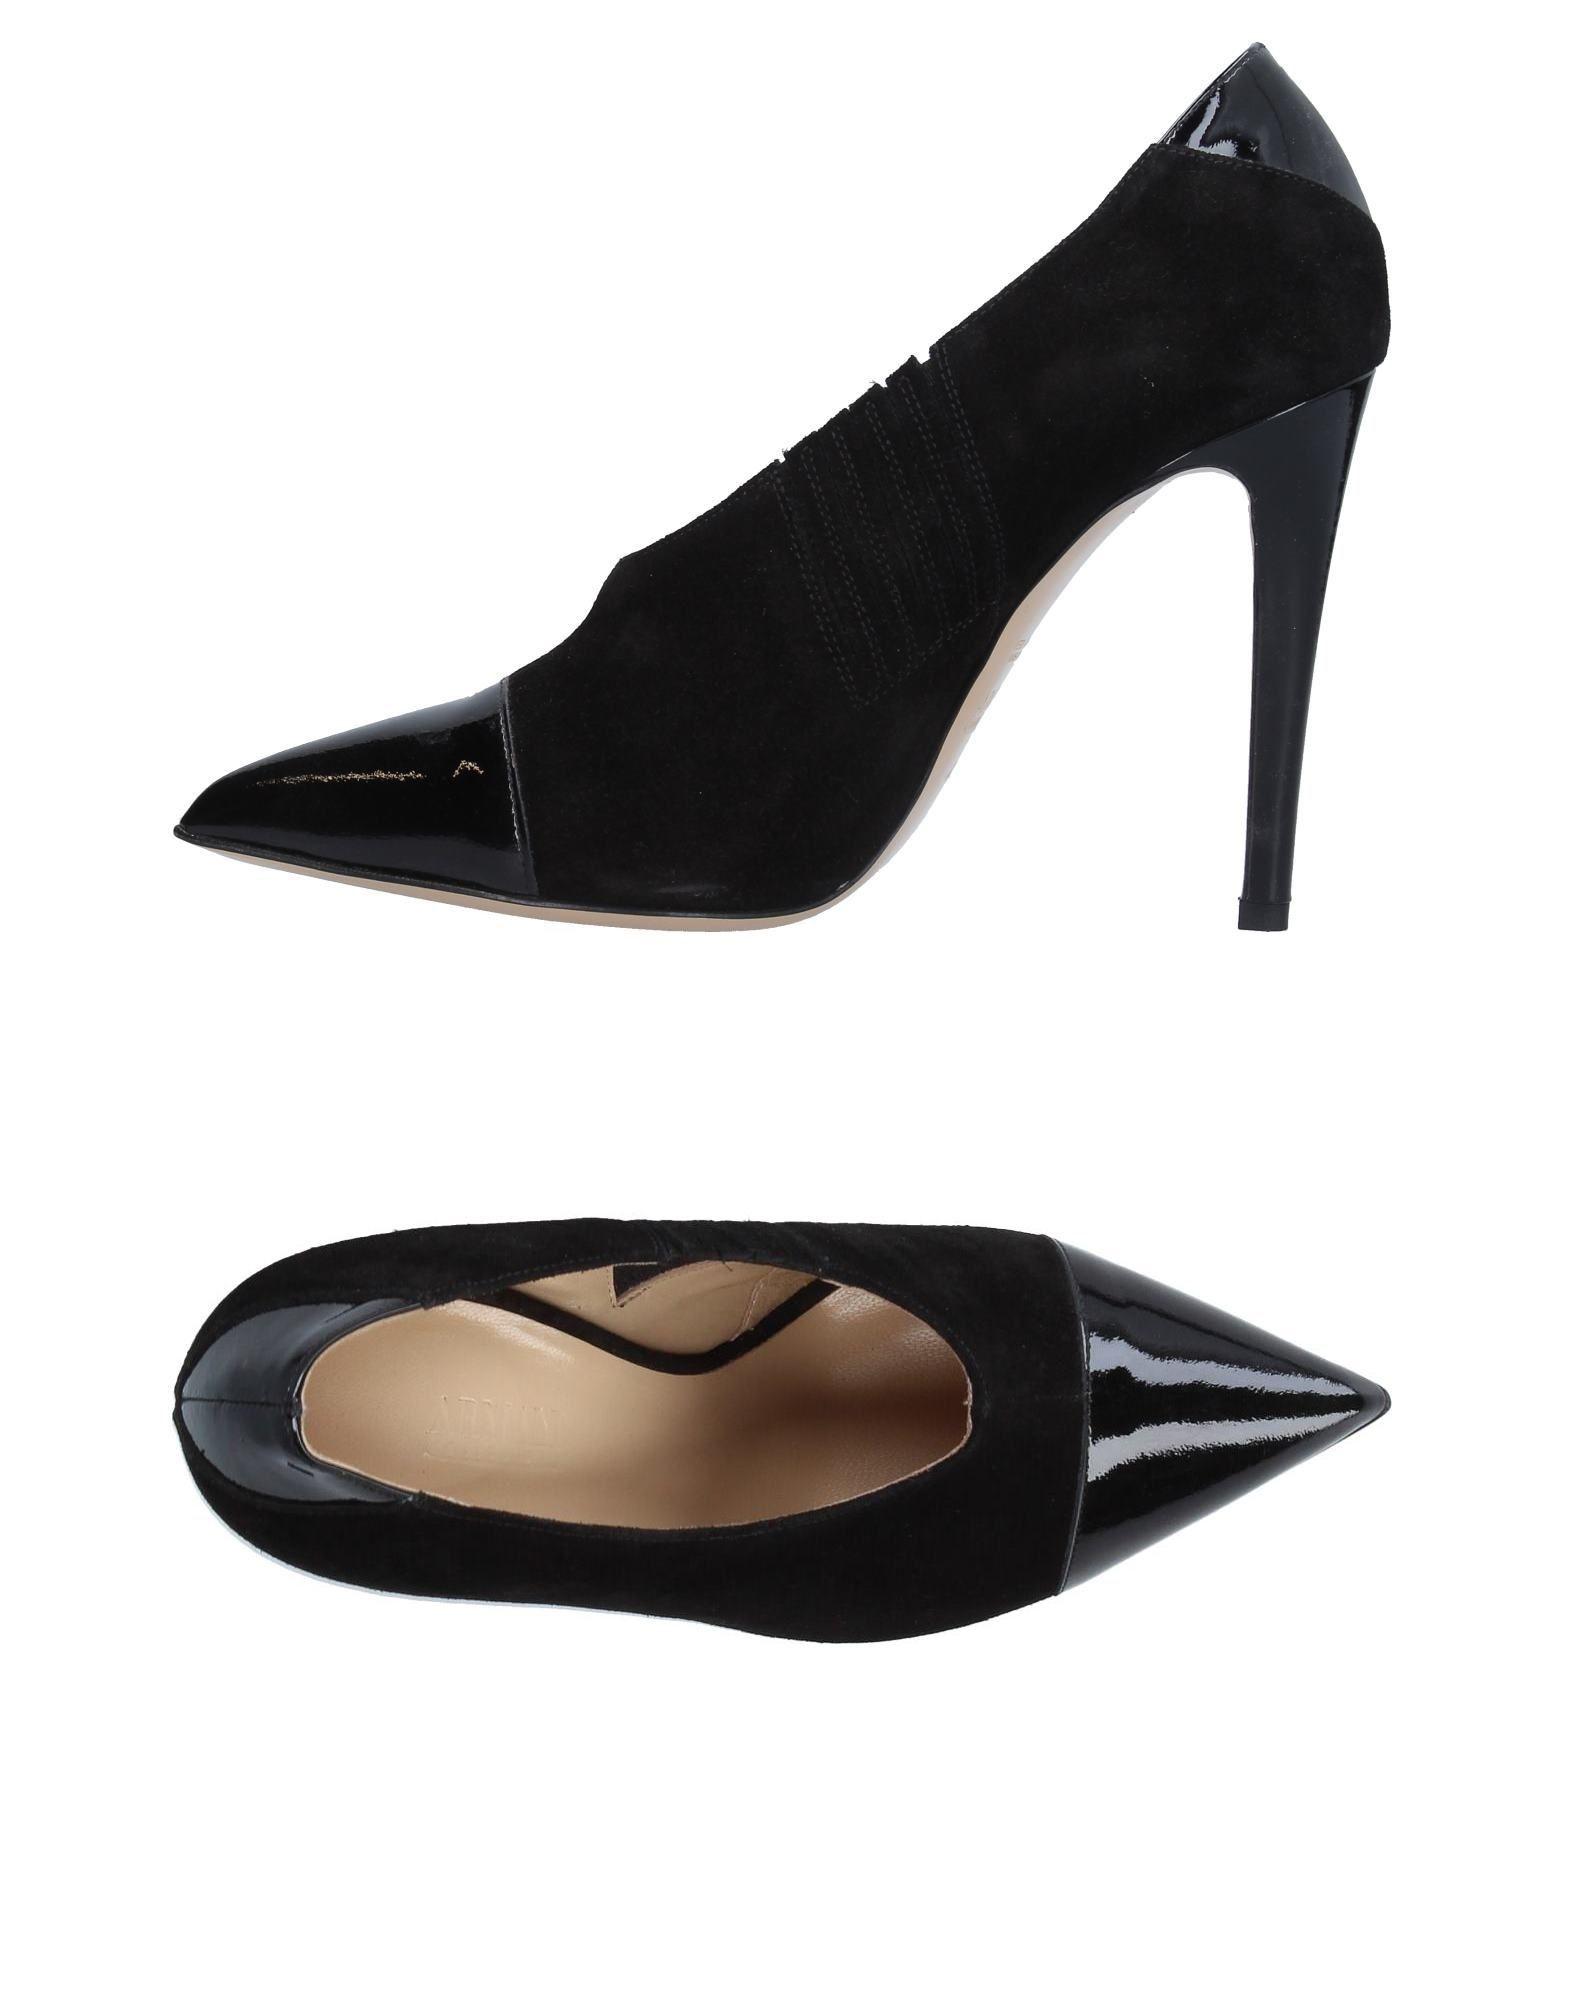 цены на ARMANI COLLEZIONI Туфли в интернет-магазинах